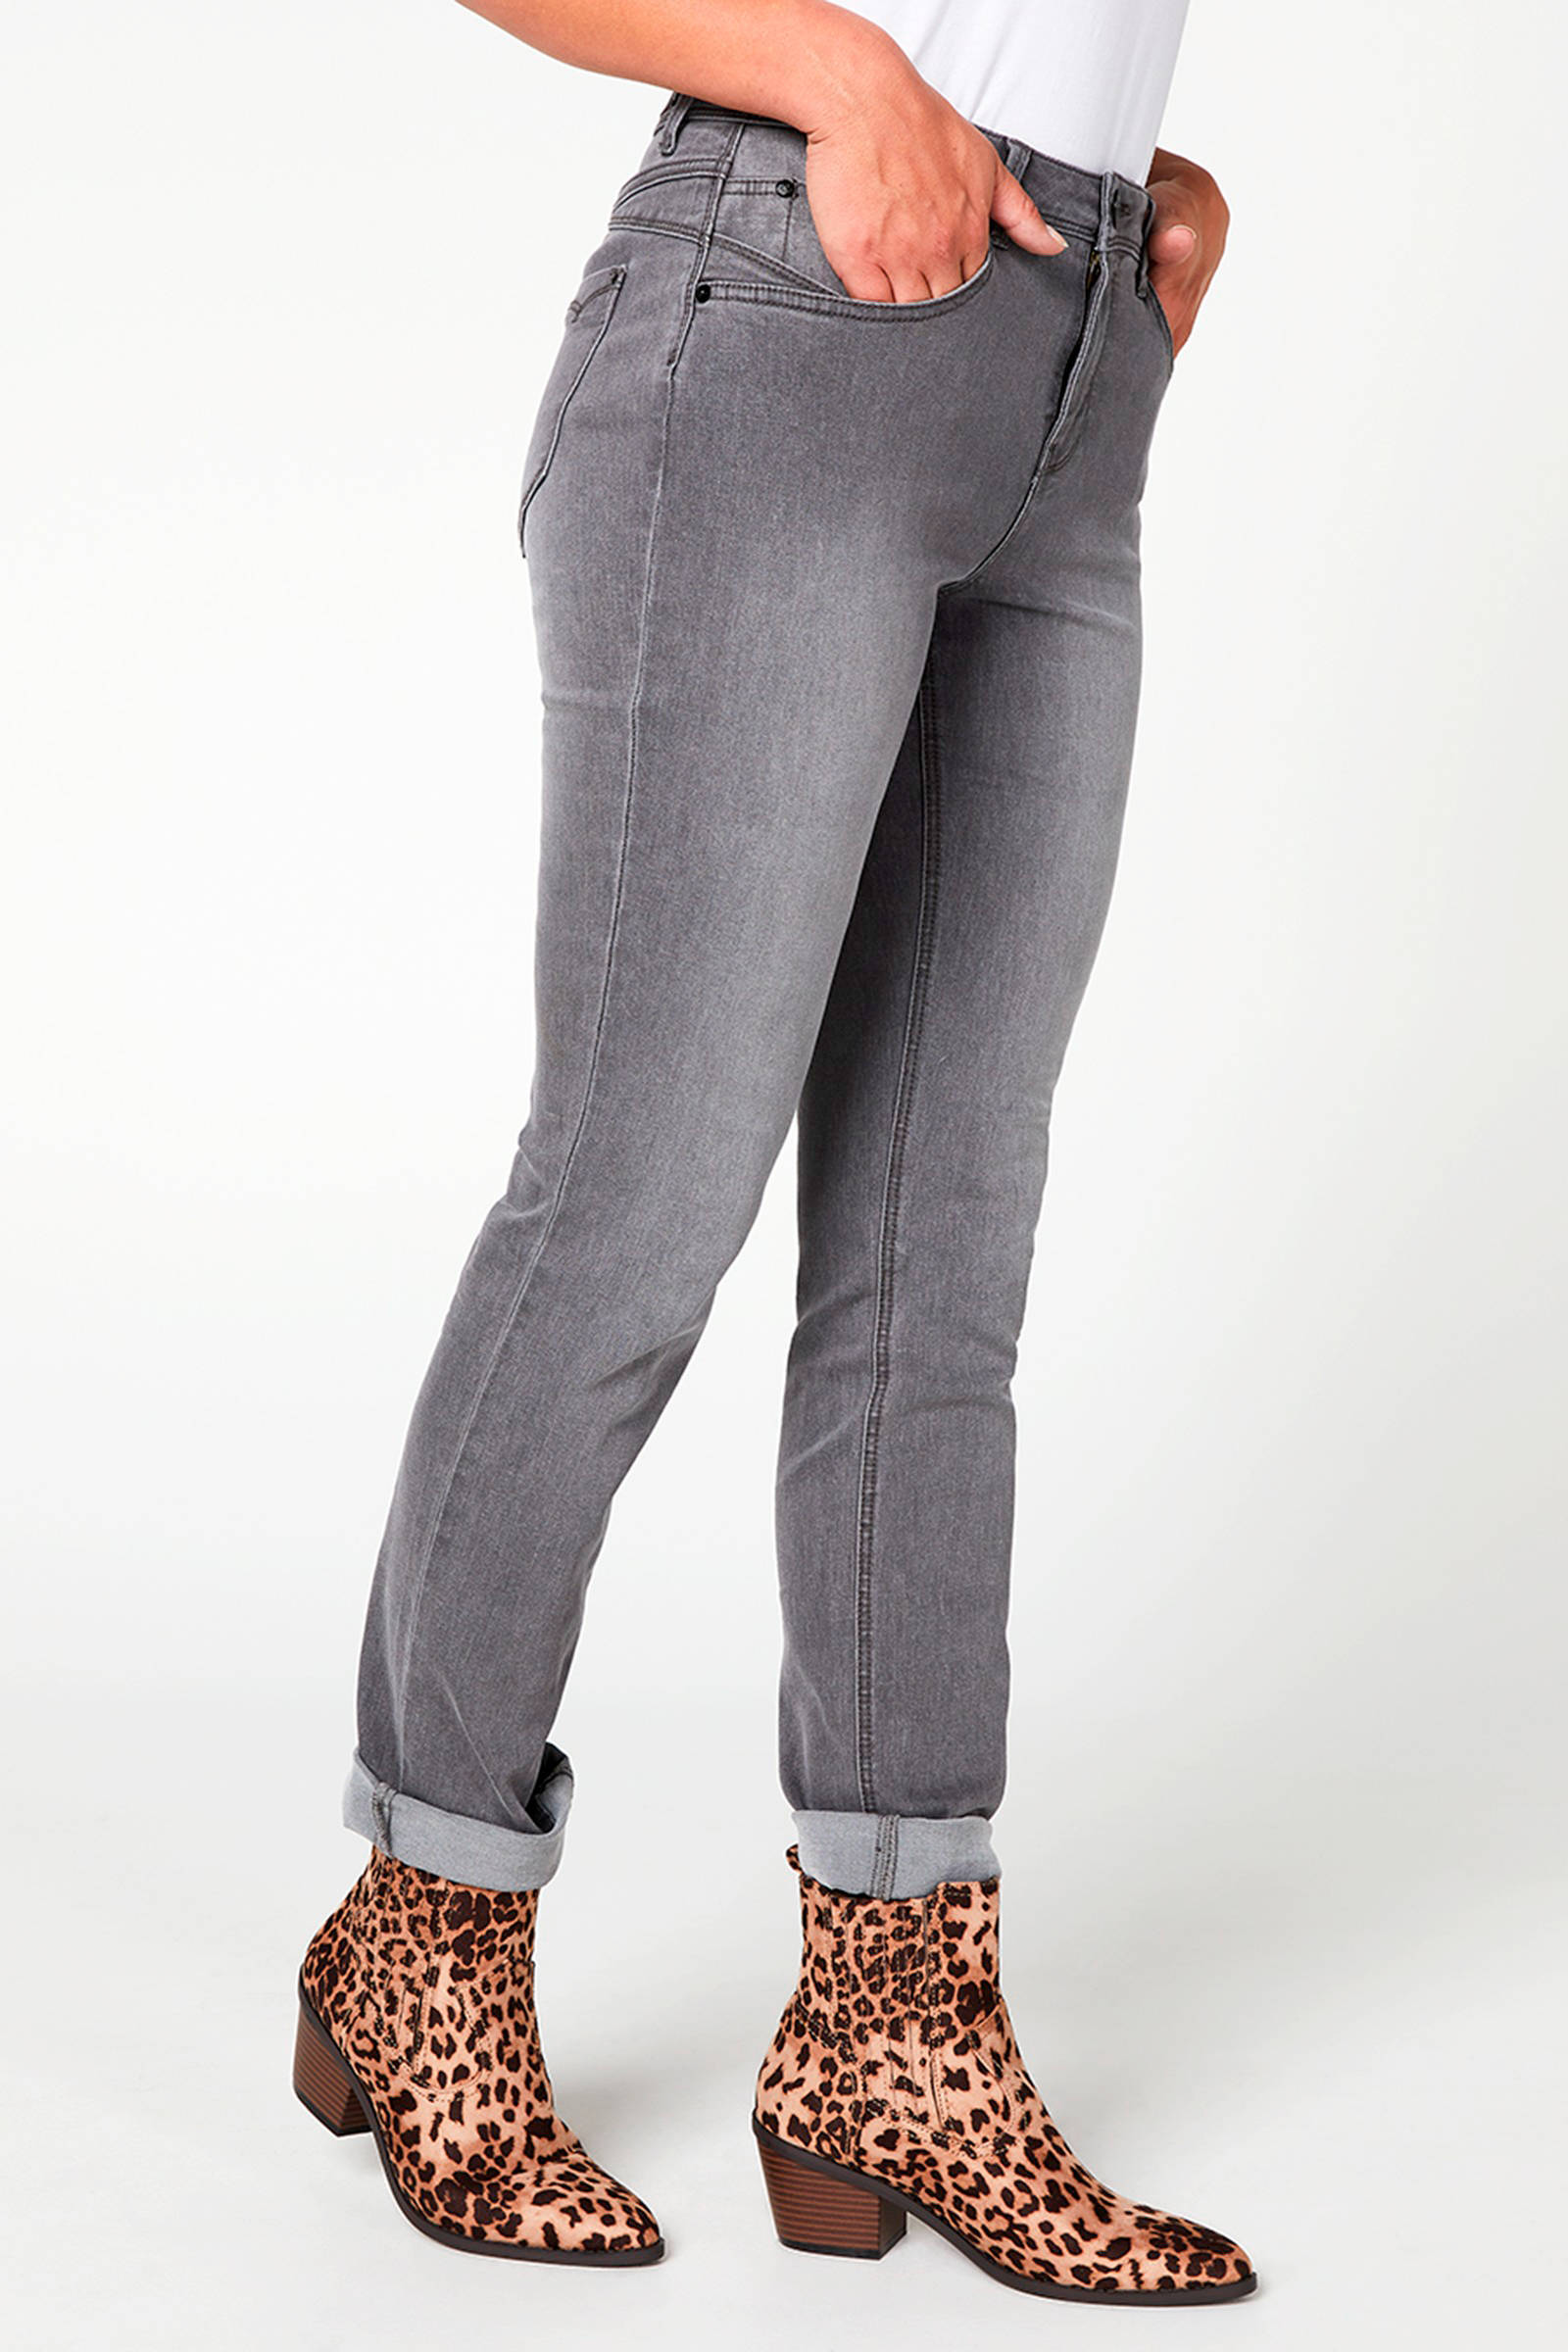 Miss Etam Regulier straight fit jeans Jackie 32 inch grijs